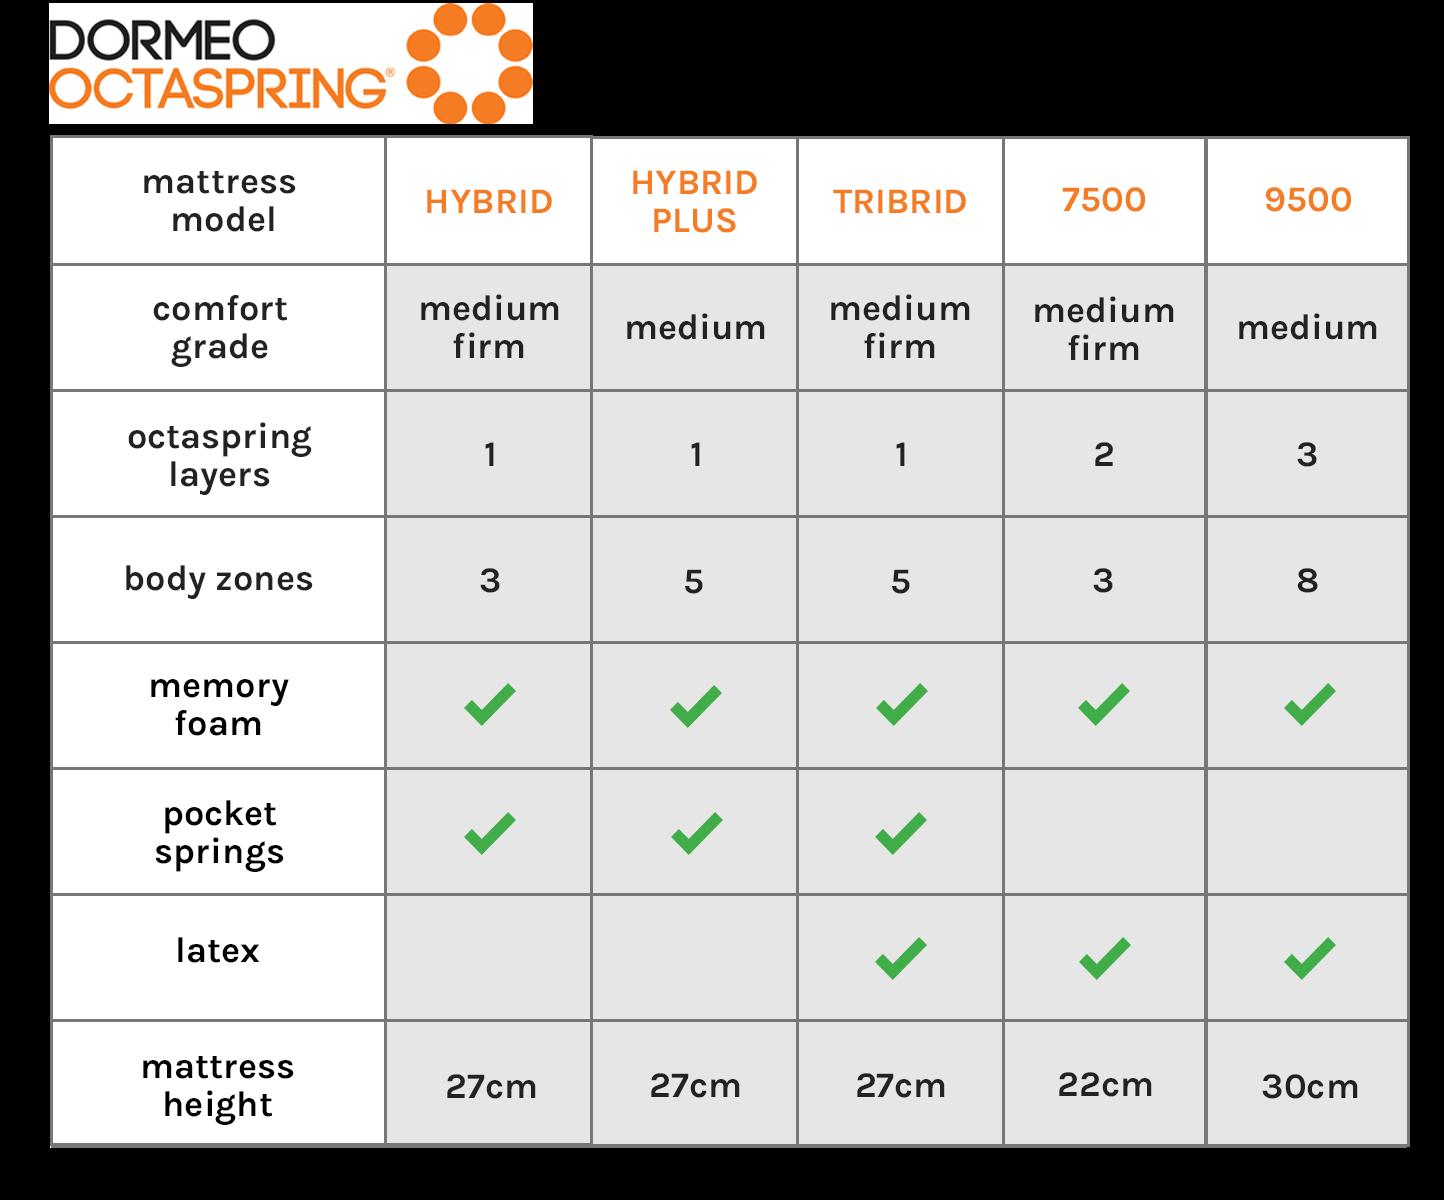 Dormeo Octaspring Hybrid Mattress Range